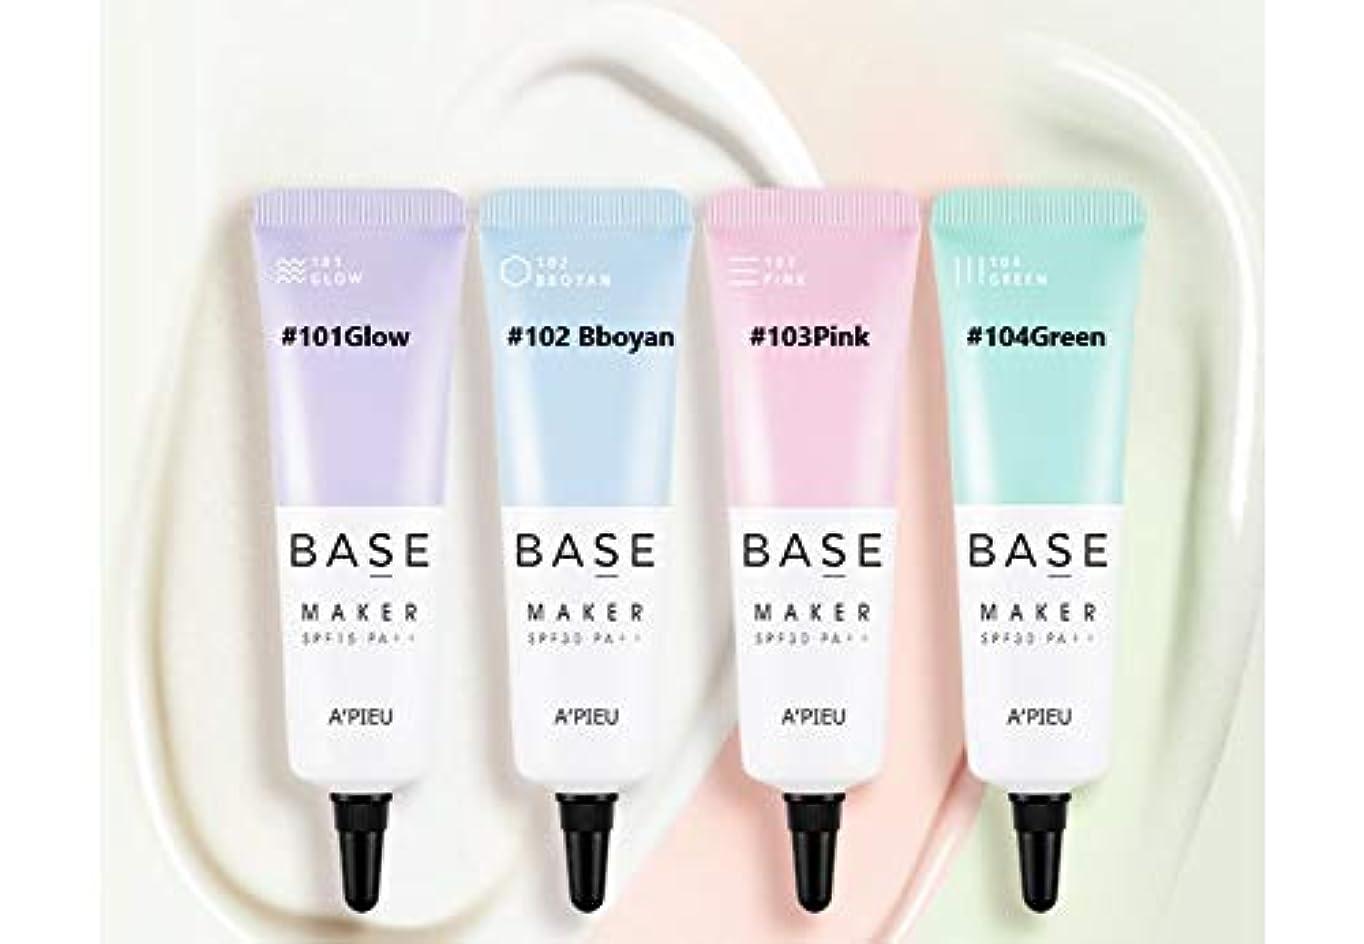 APIEU☆Base Maker 20g ☆オピュ ベース メーカー20g全4色 [並行輸入品] (#101Glow)